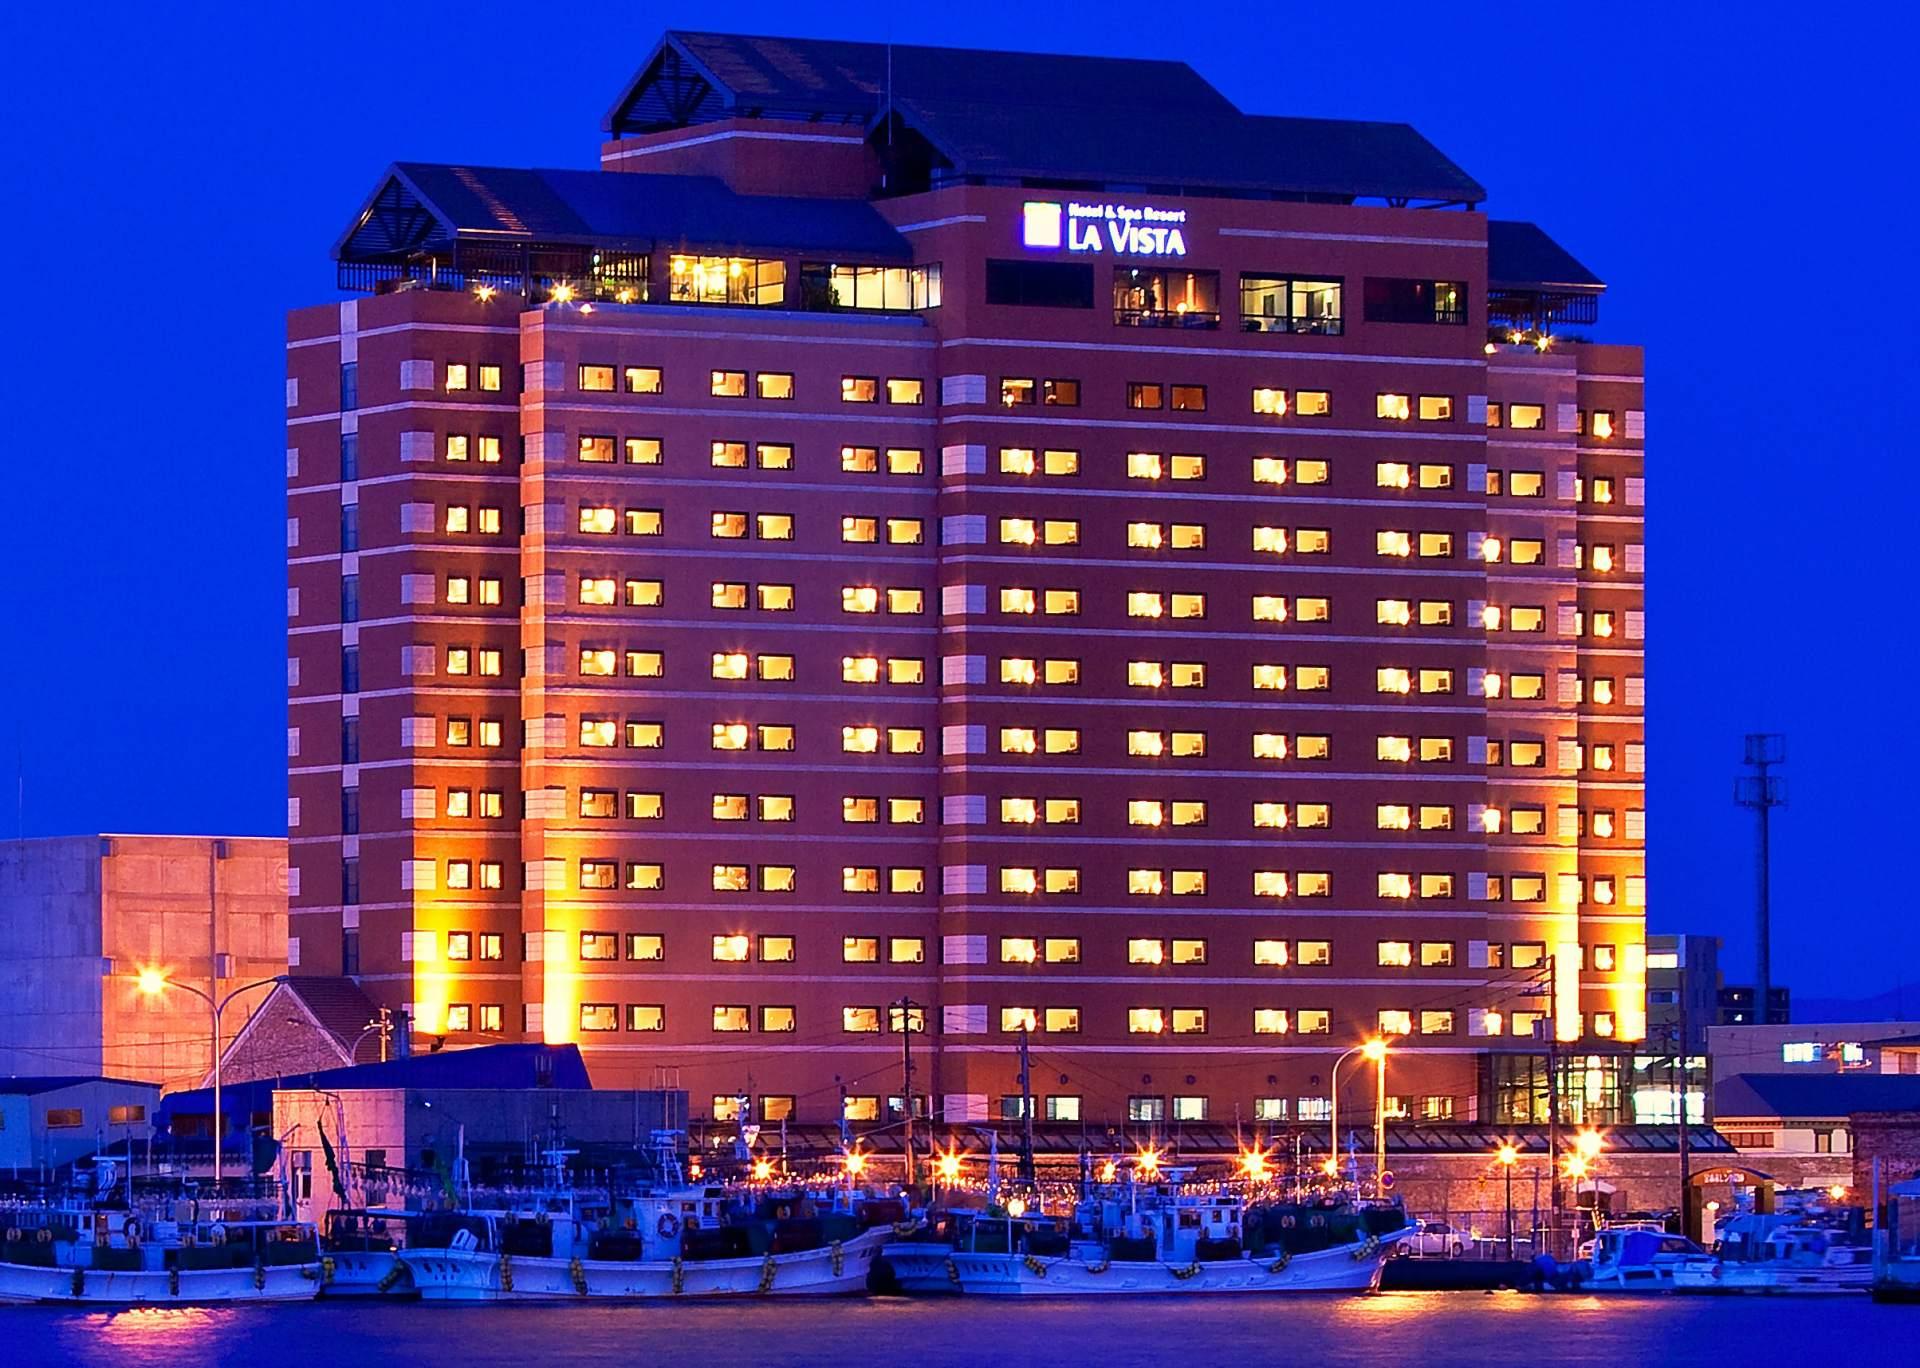 La Vista函館海濱飯店 外觀